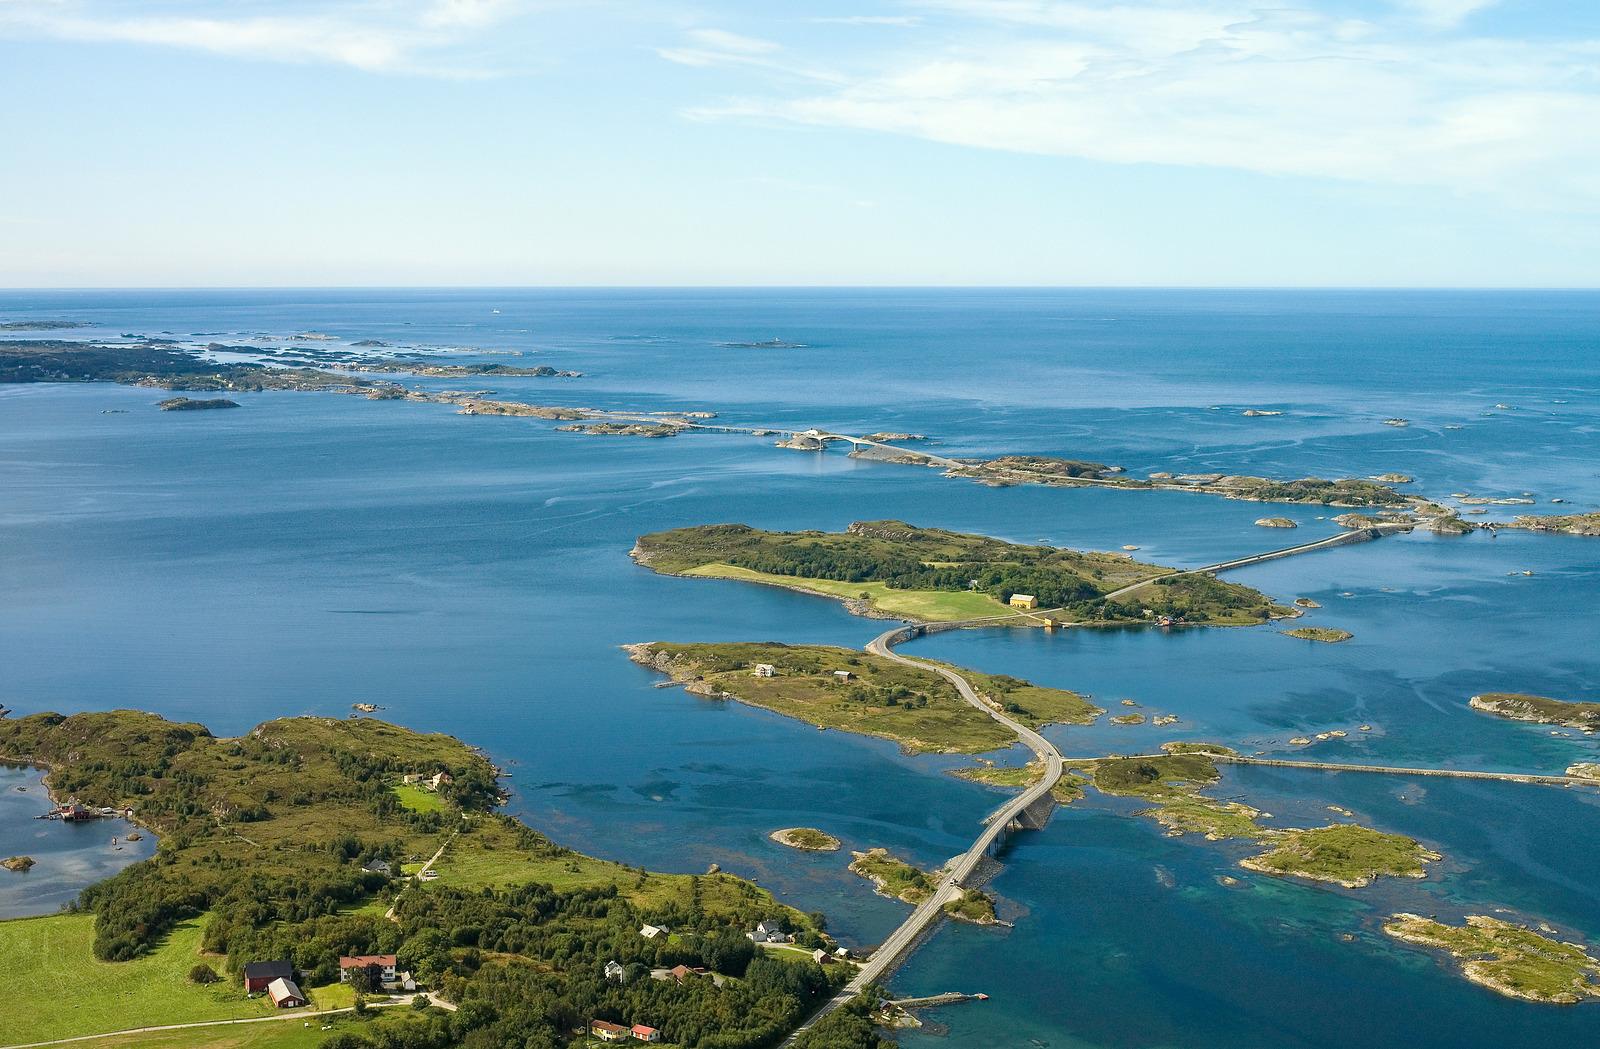 Atlantic Road / Atlanterhavsvegen, August 29th. Photo by Harald Mowinckel / Statens Vegvesen.